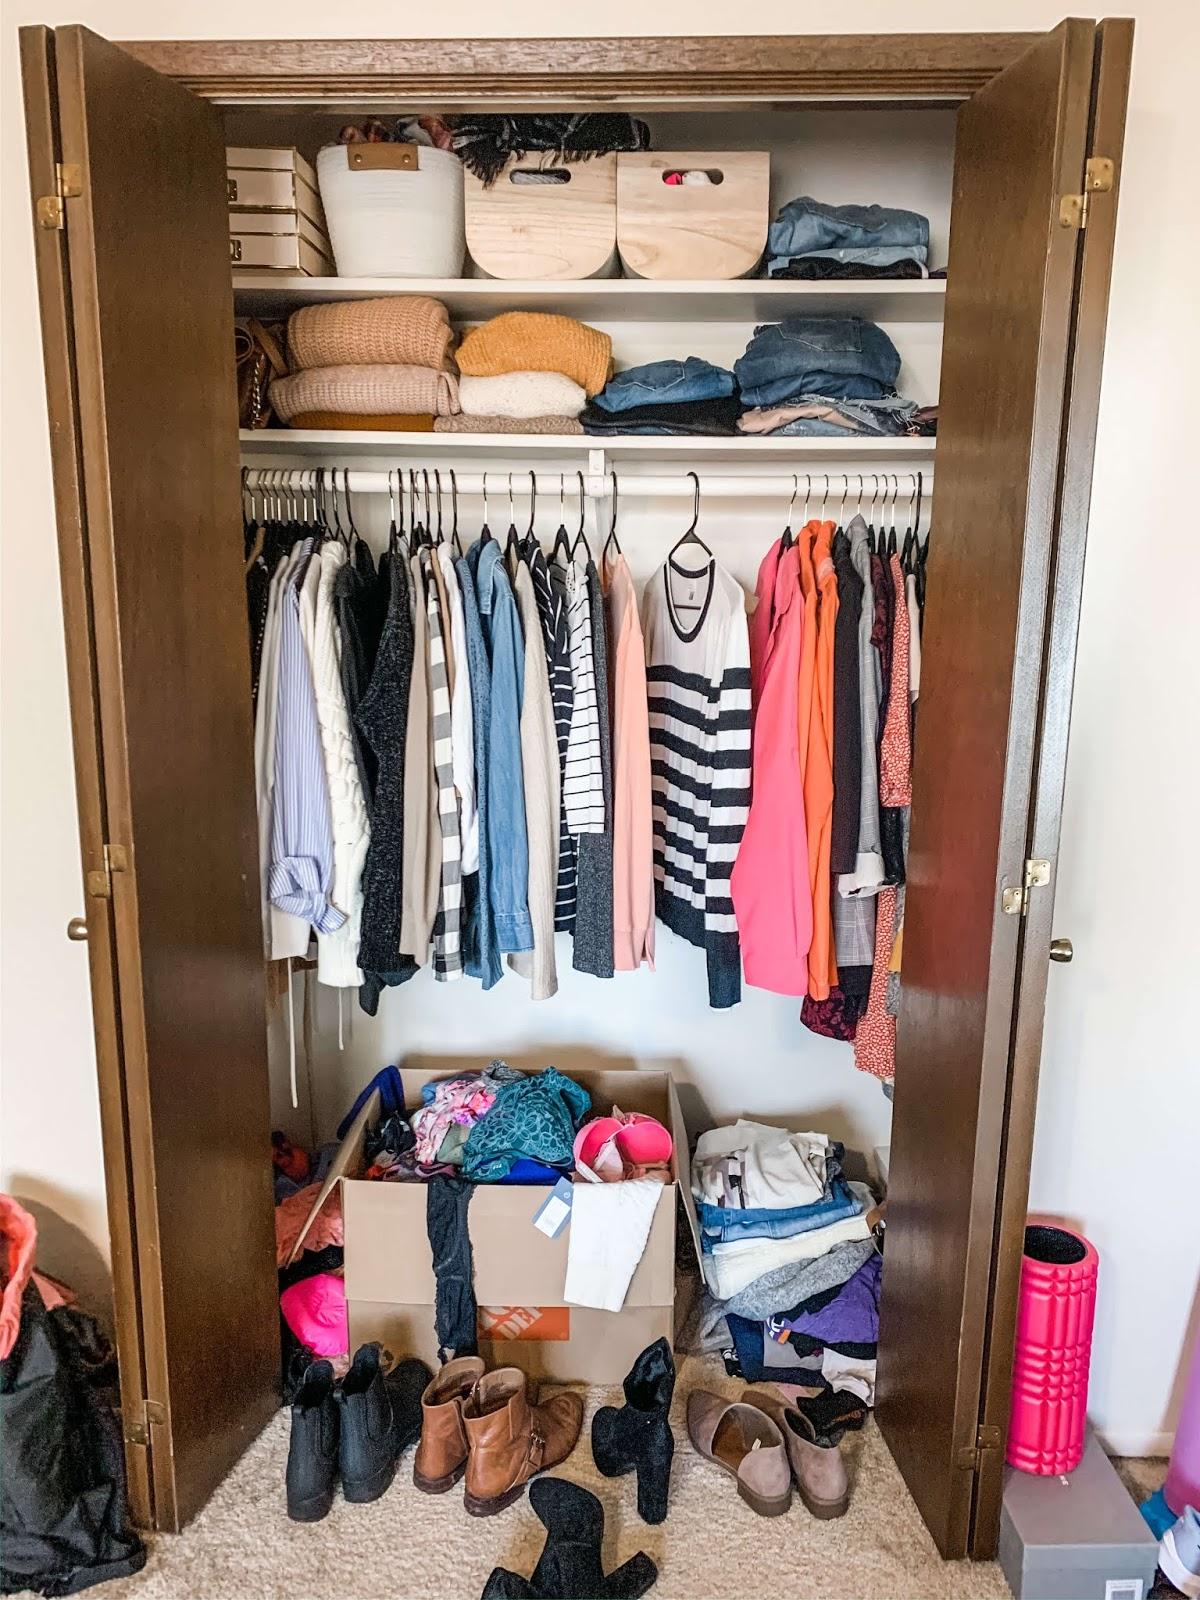 My messy bedroom closet